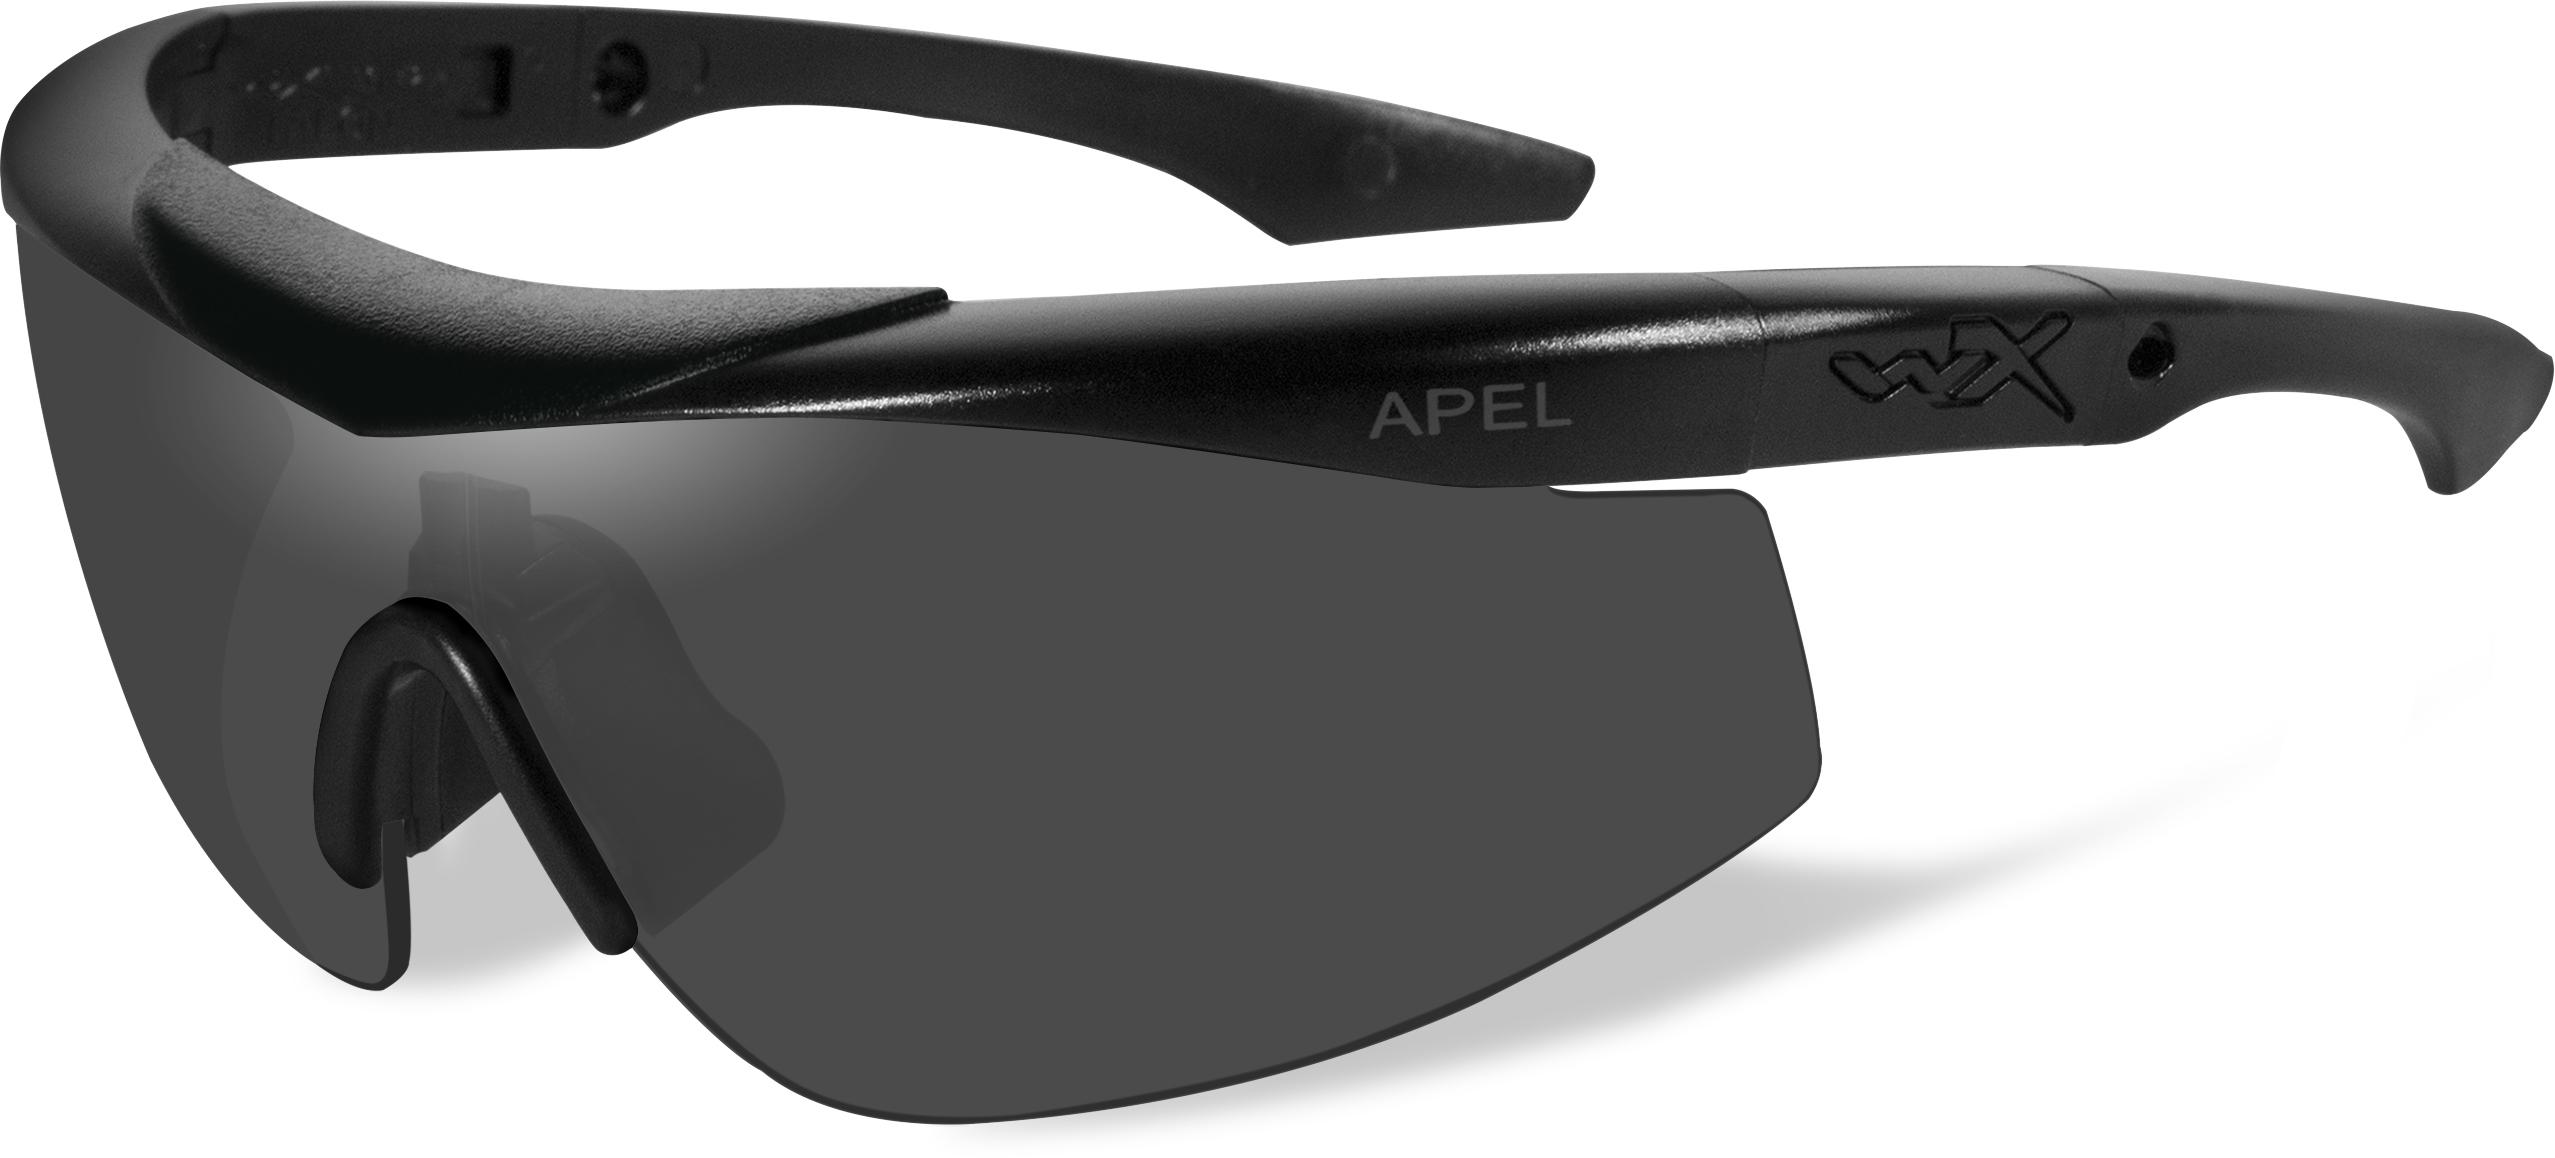 e7356717e3 Wiley X WX Talon Sunglasses